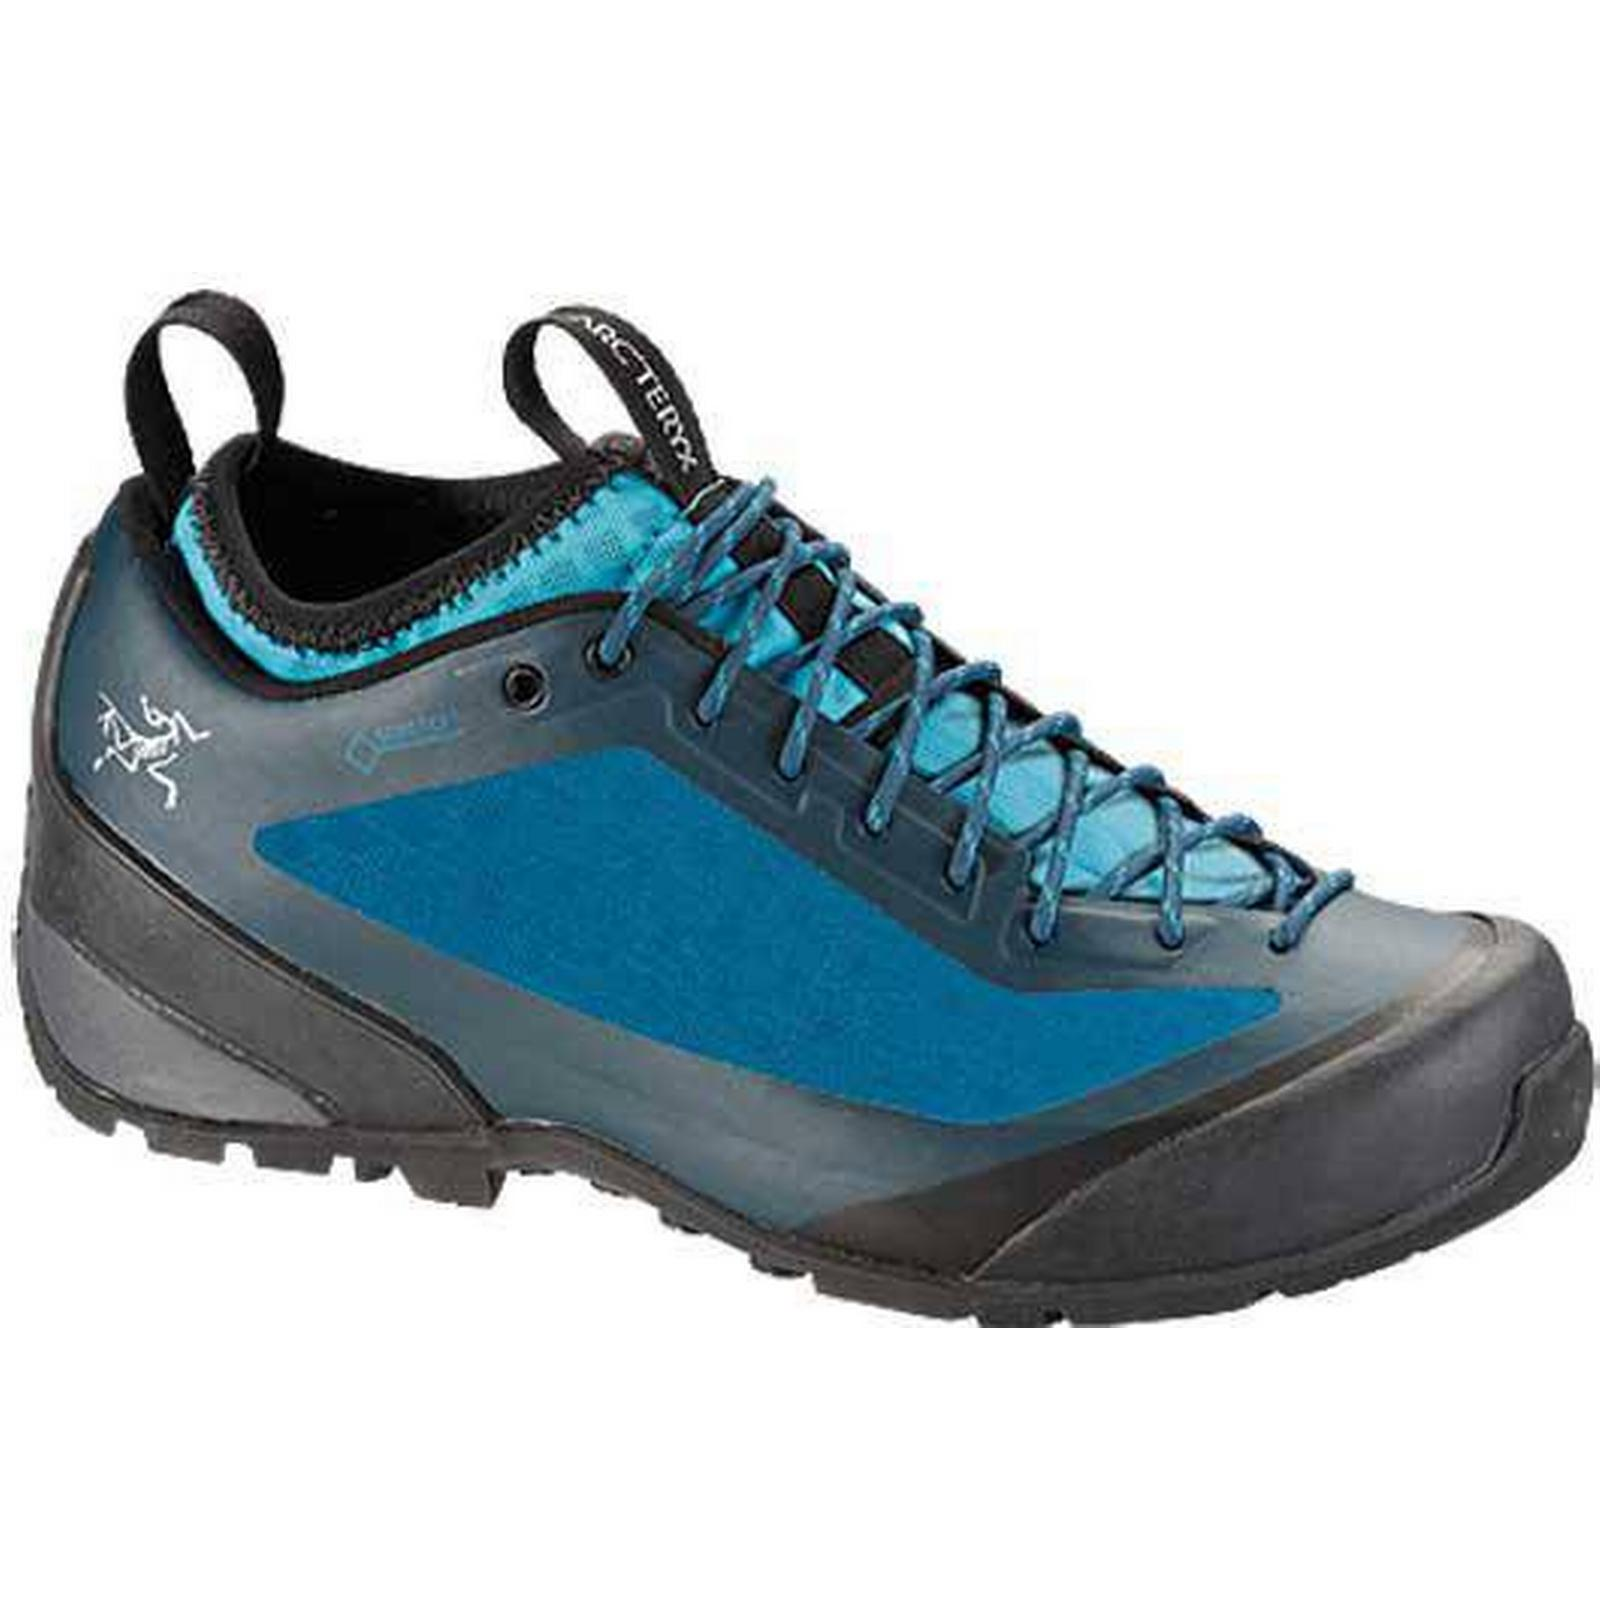 Arc-teryx Alpha Fl Fl Alpha Goretex Approach Shoe ba0502